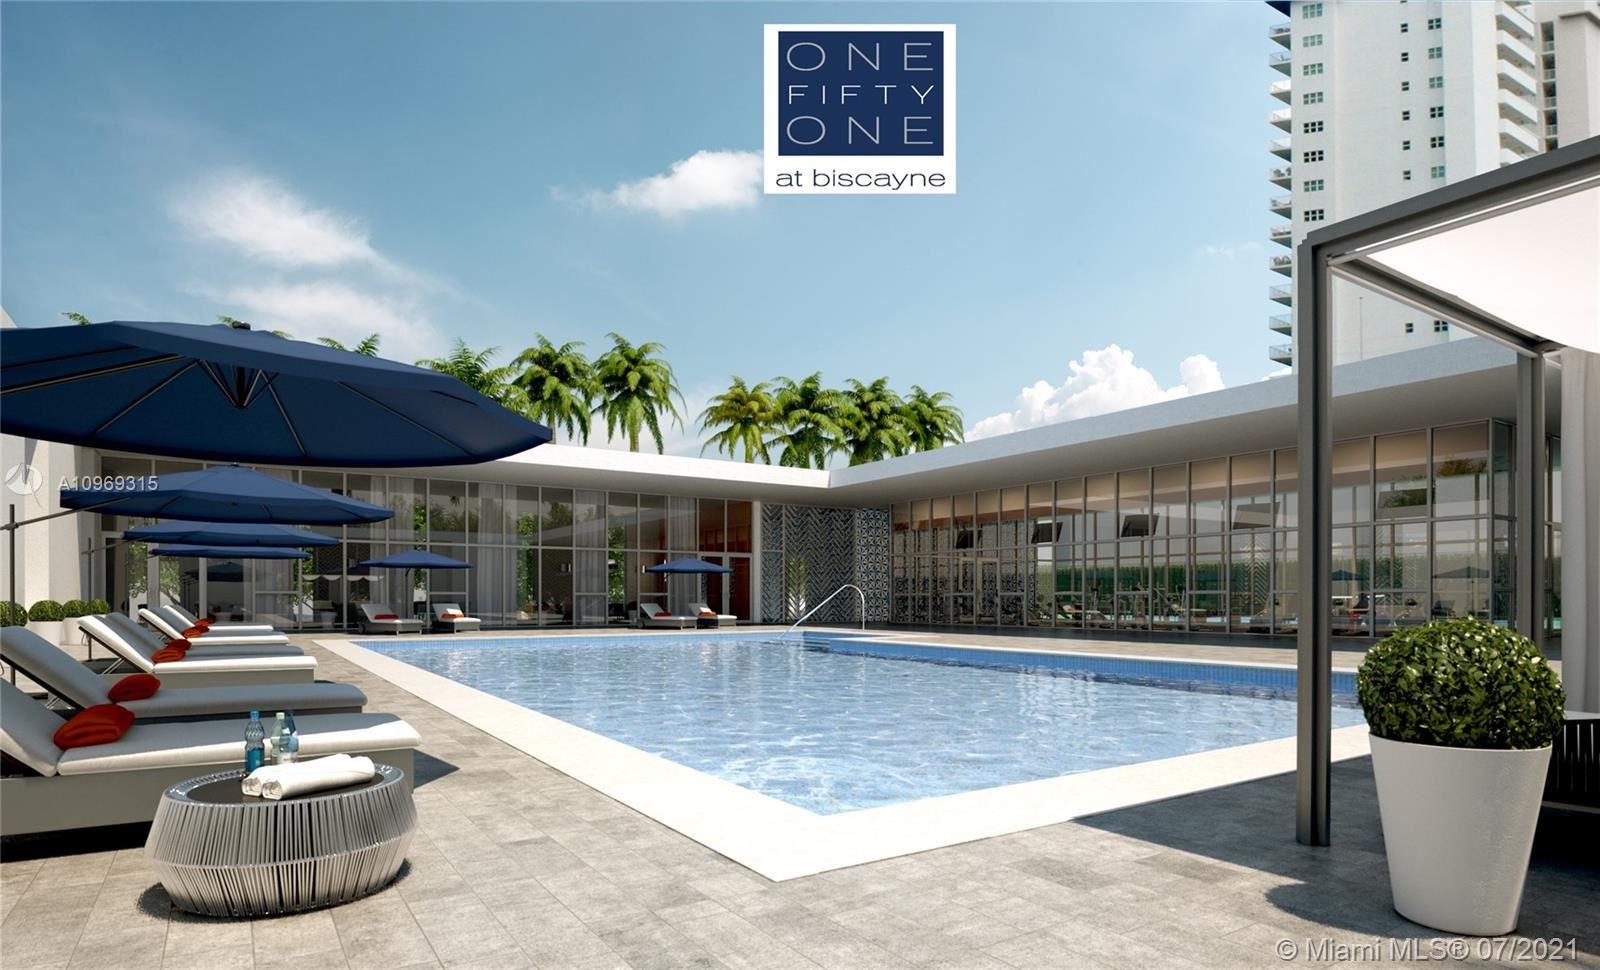 14951 Royal Oaks Ln #207, North Miami, FL 33181 - #: A10969315